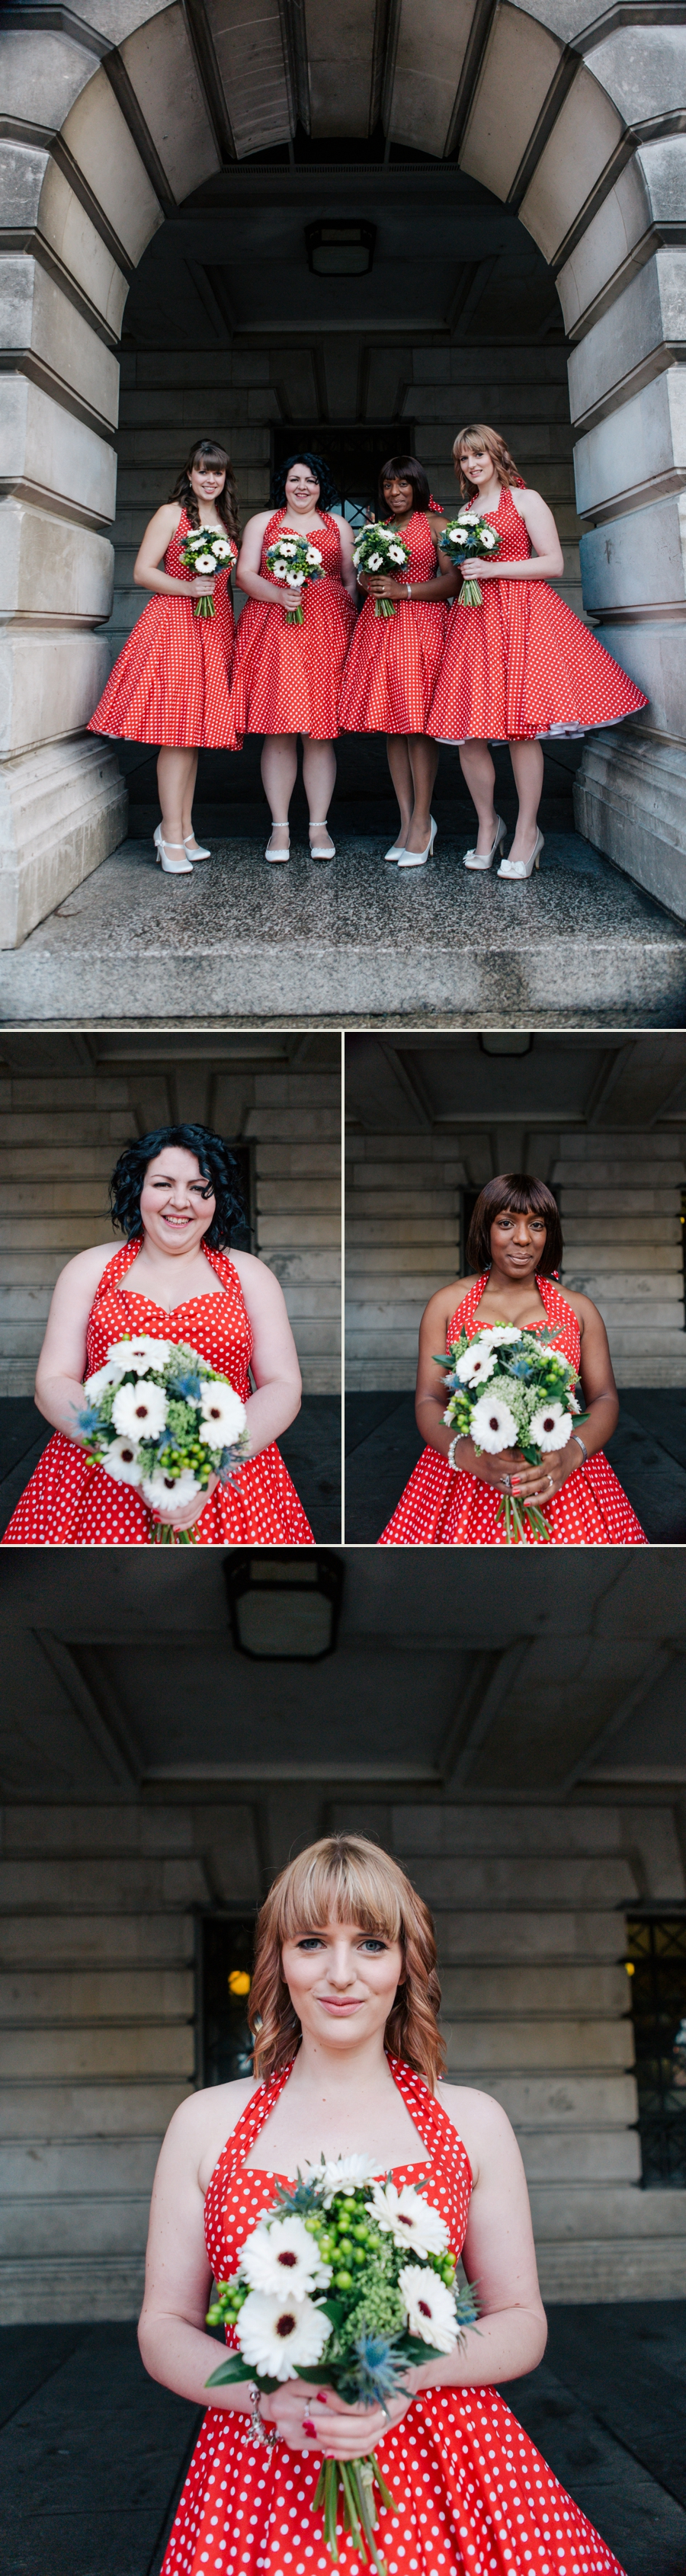 Somerset wedding Photographer Angela and Darren 14